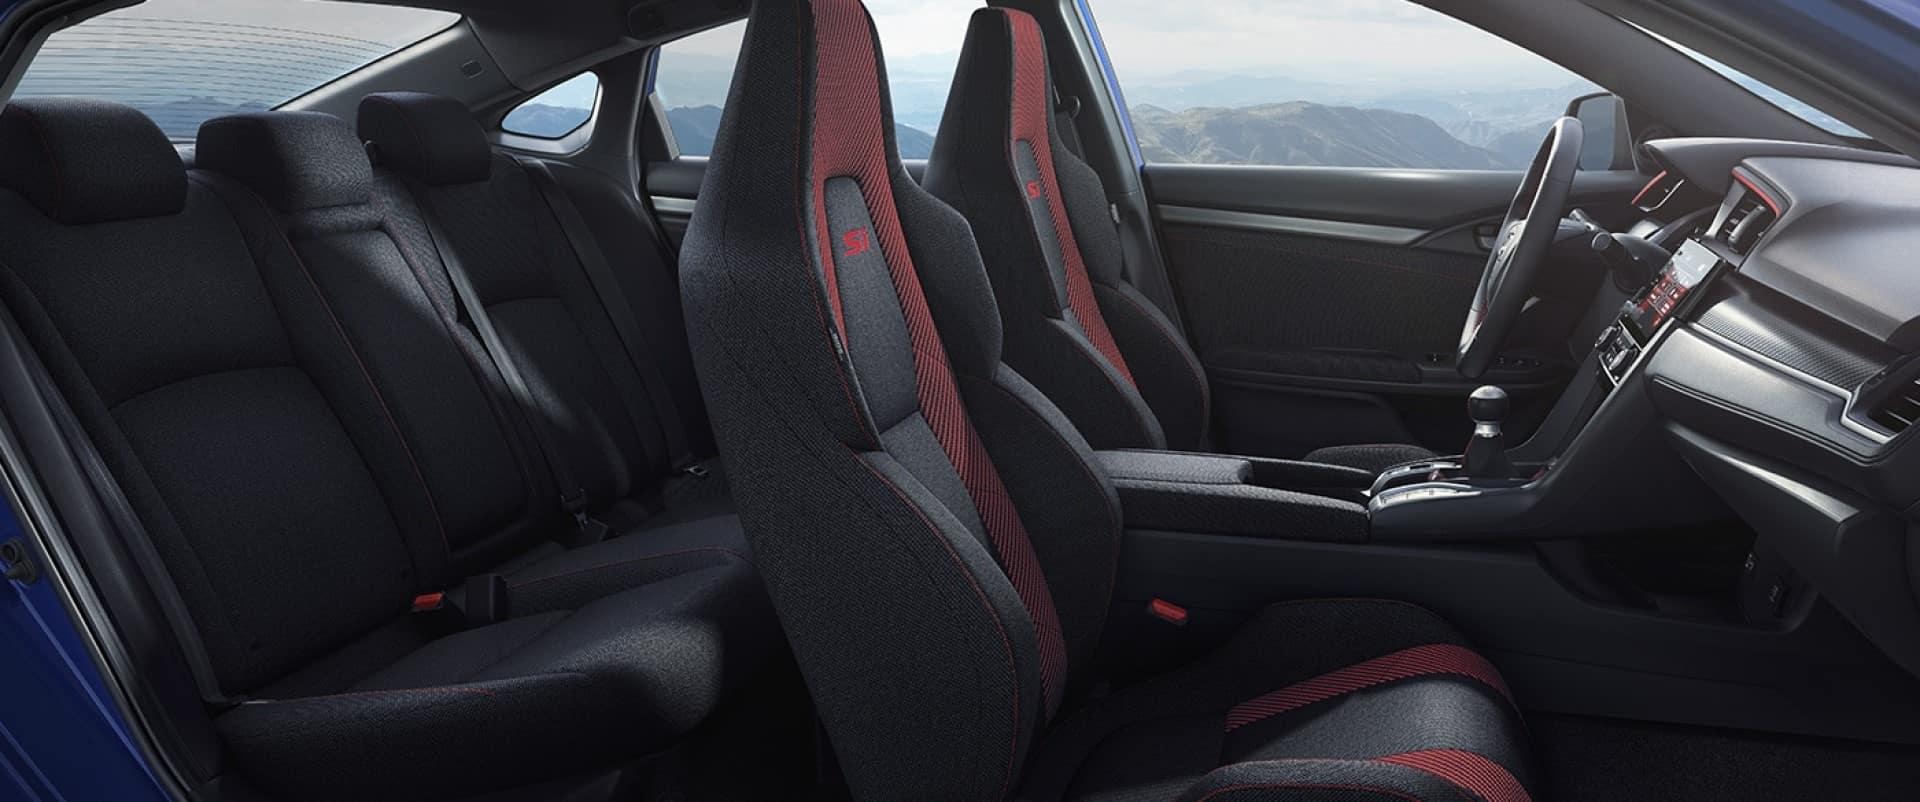 Honda_Civic_Si_Sedan_Interior_Cabin